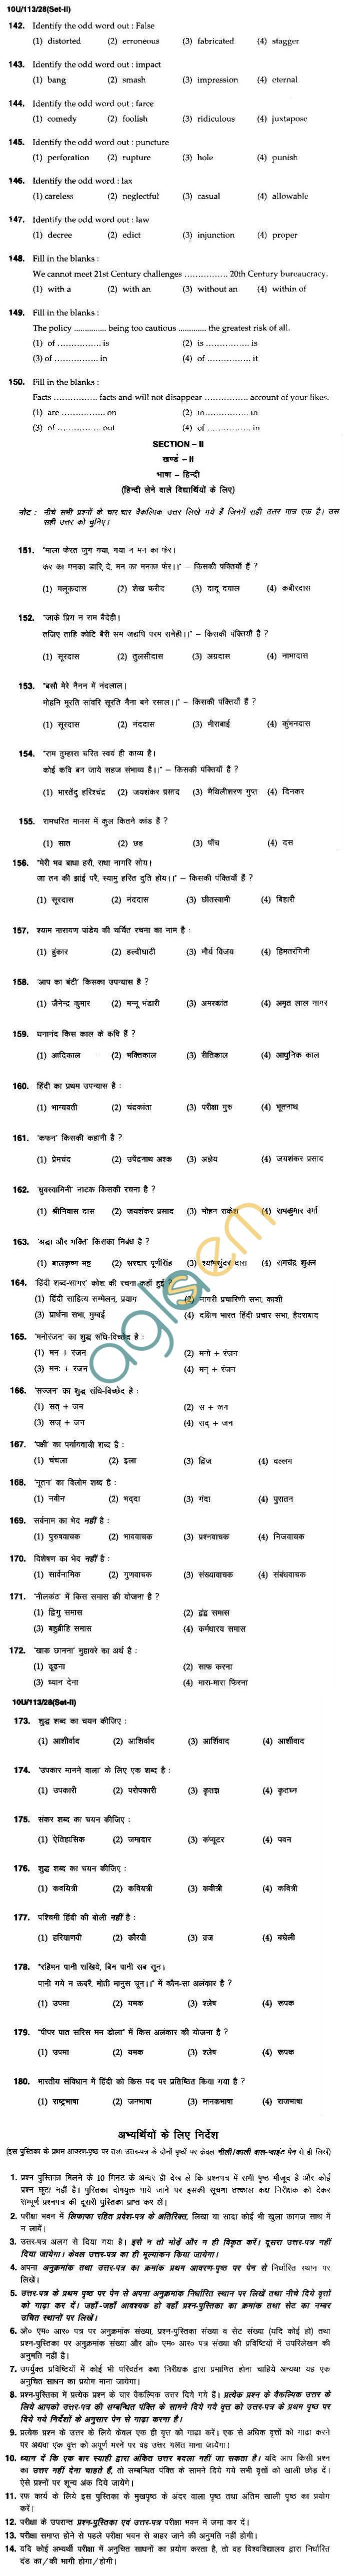 BHU UET 2010 B.A. ARTS Question Paper